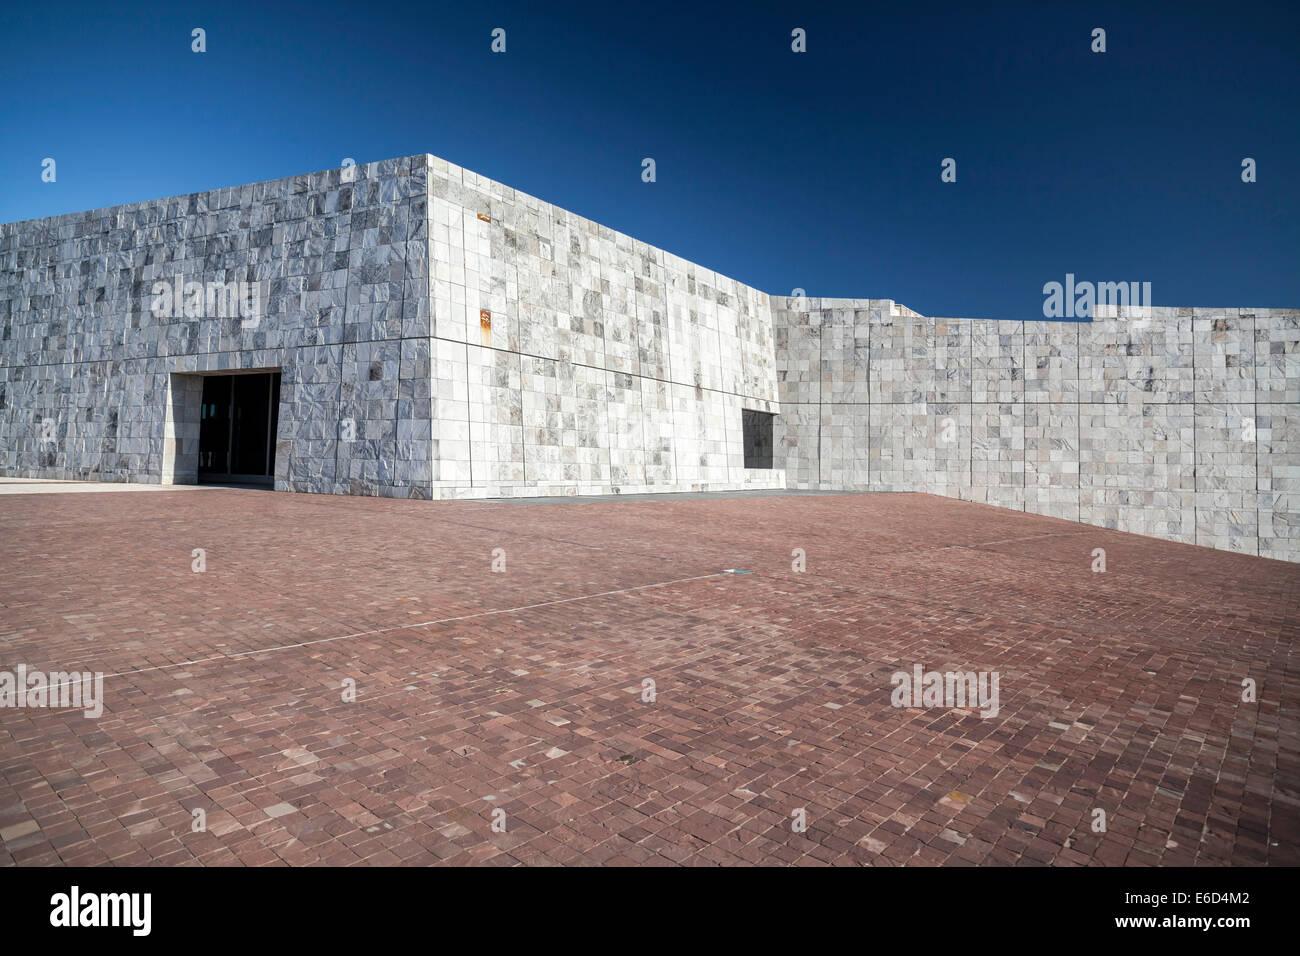 Santiago de Compostela. Cidade cultura galizia progettato da Peter Eisenman Immagini Stock